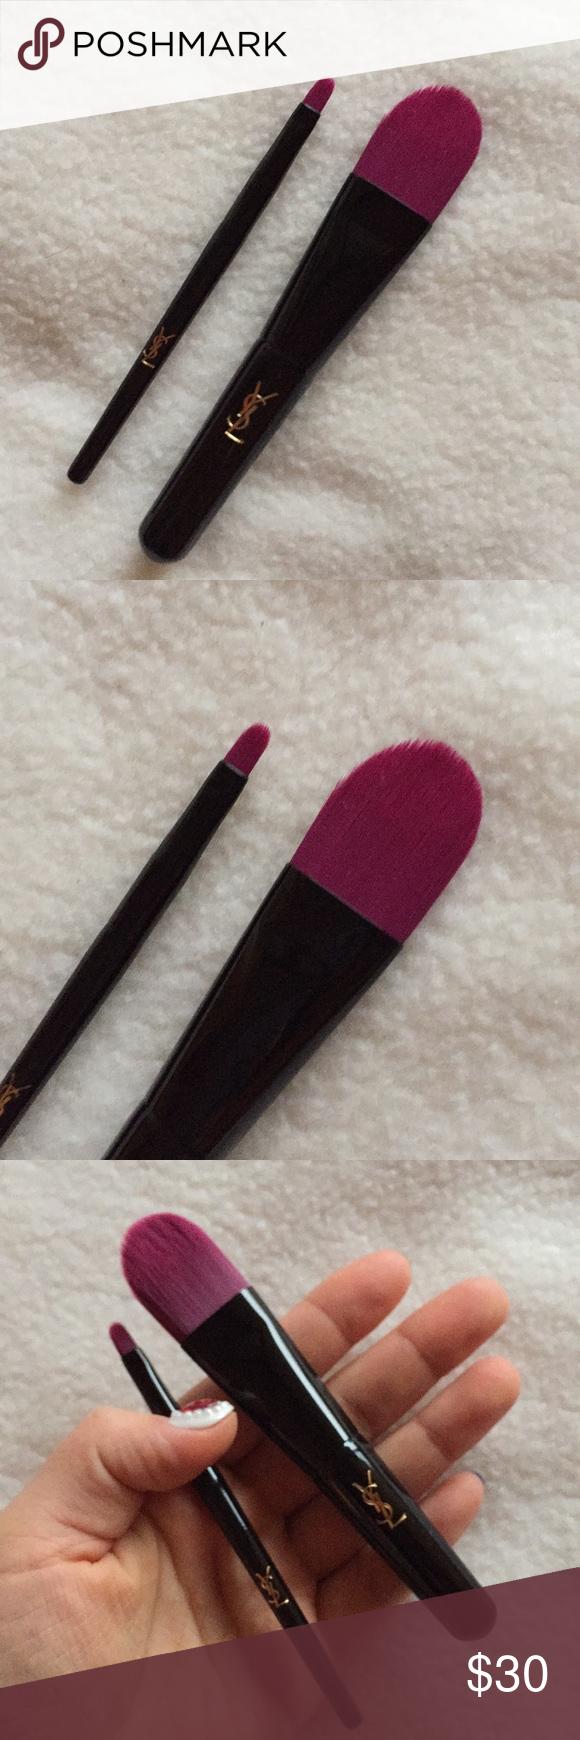 YSL beauty makeup brush bundle Ysl beauty, Beauty makeup